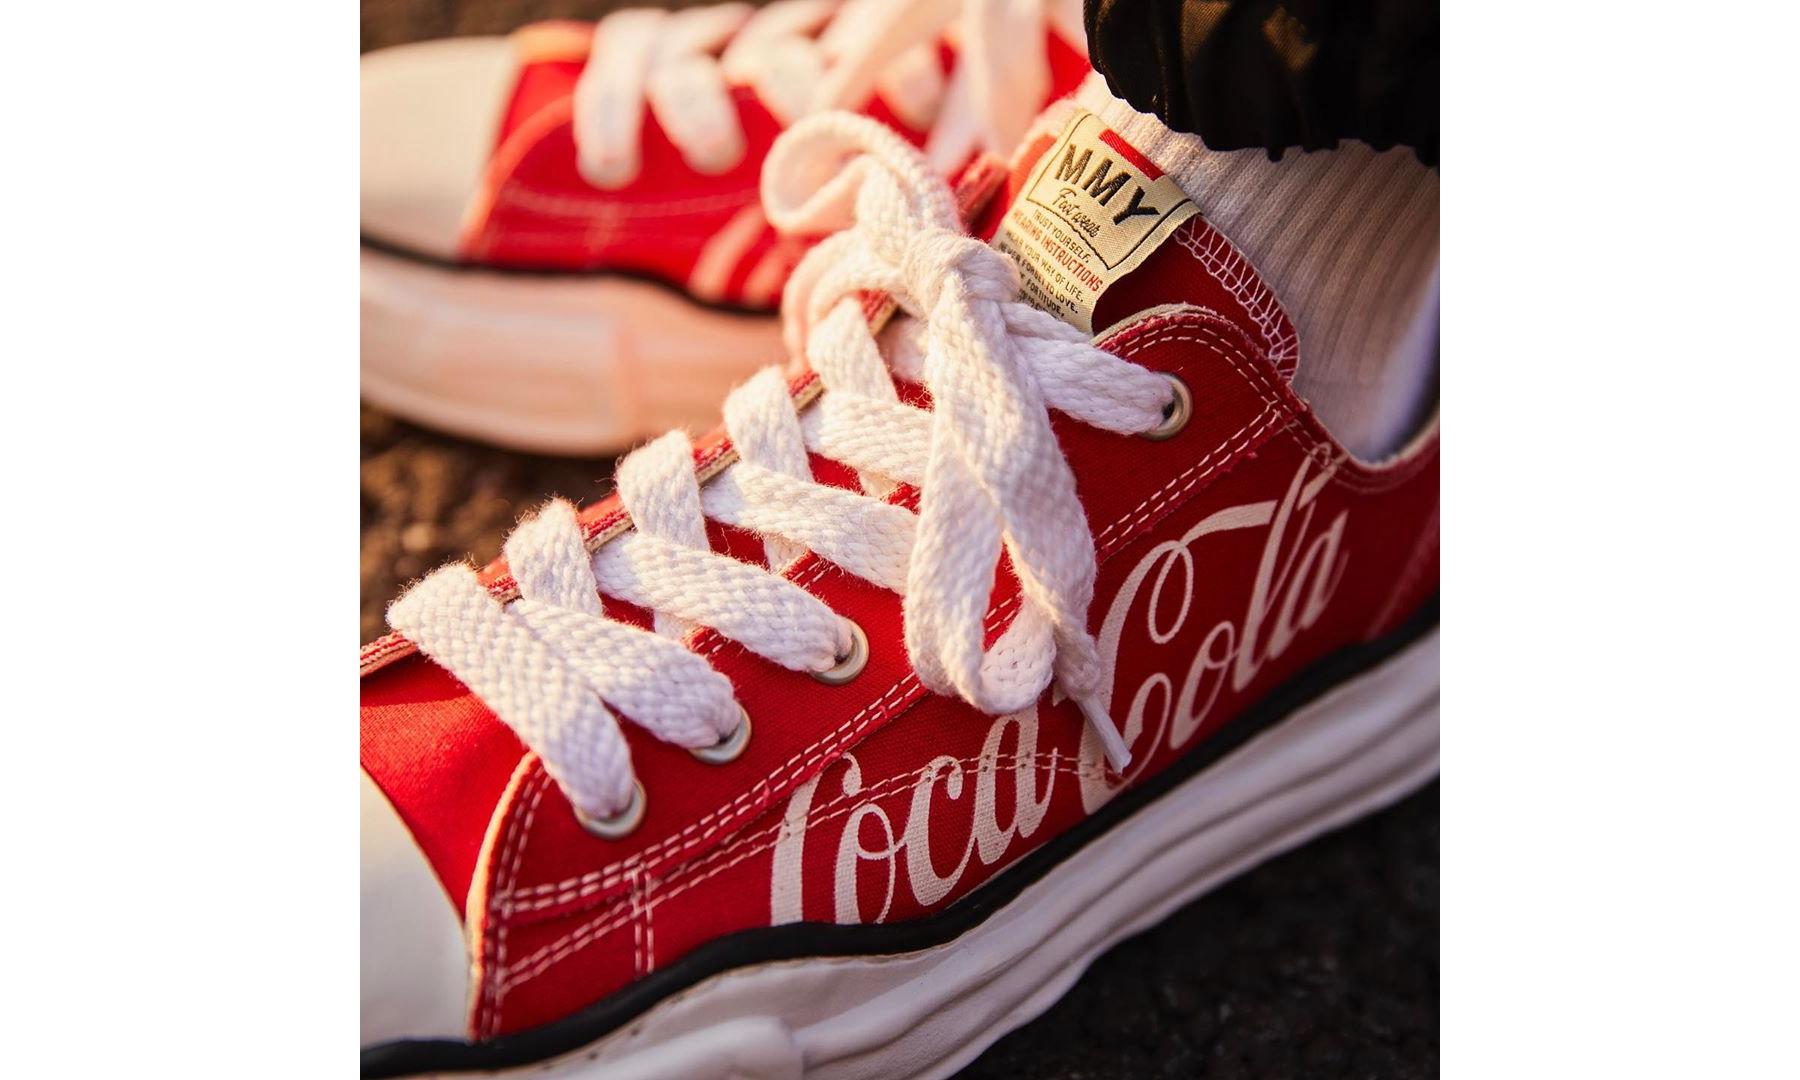 atmos x Coca-Cola x Maison MIHARA YASUHIRO 三方联乘鞋款即将登场